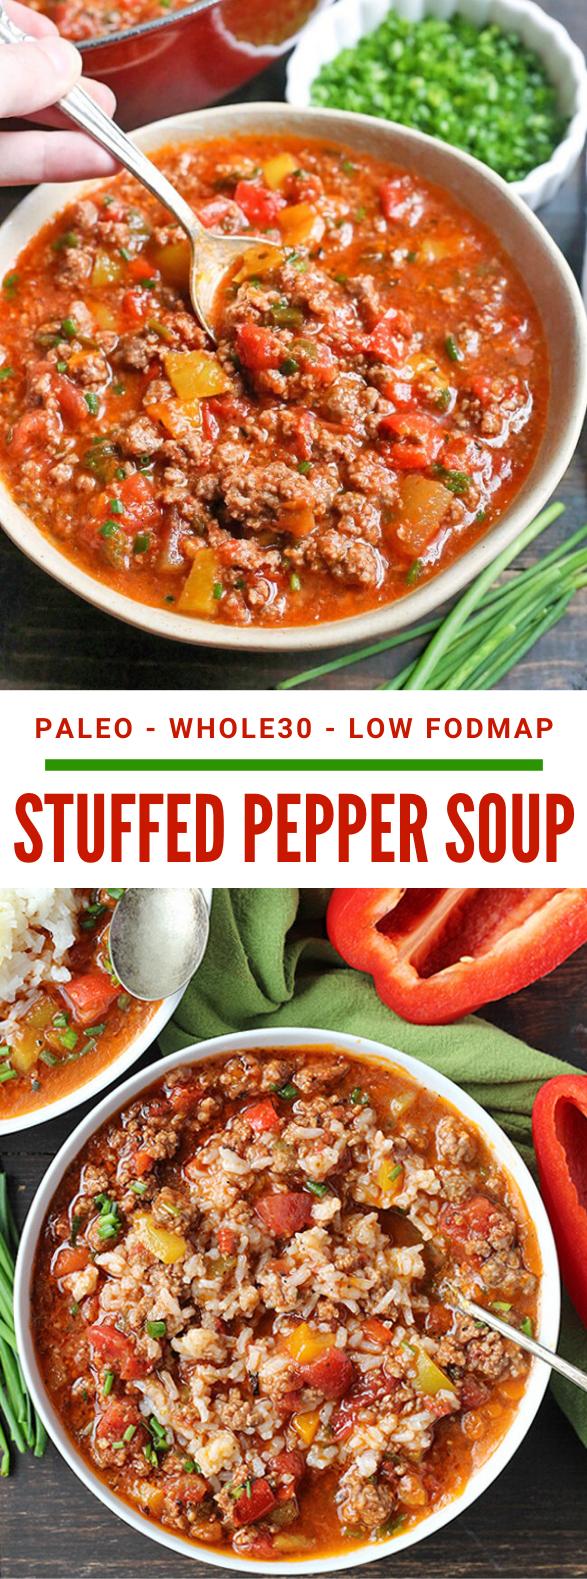 PALEO WHOLE30 STUFFED PEPPER SOUP #healthy #instantpot